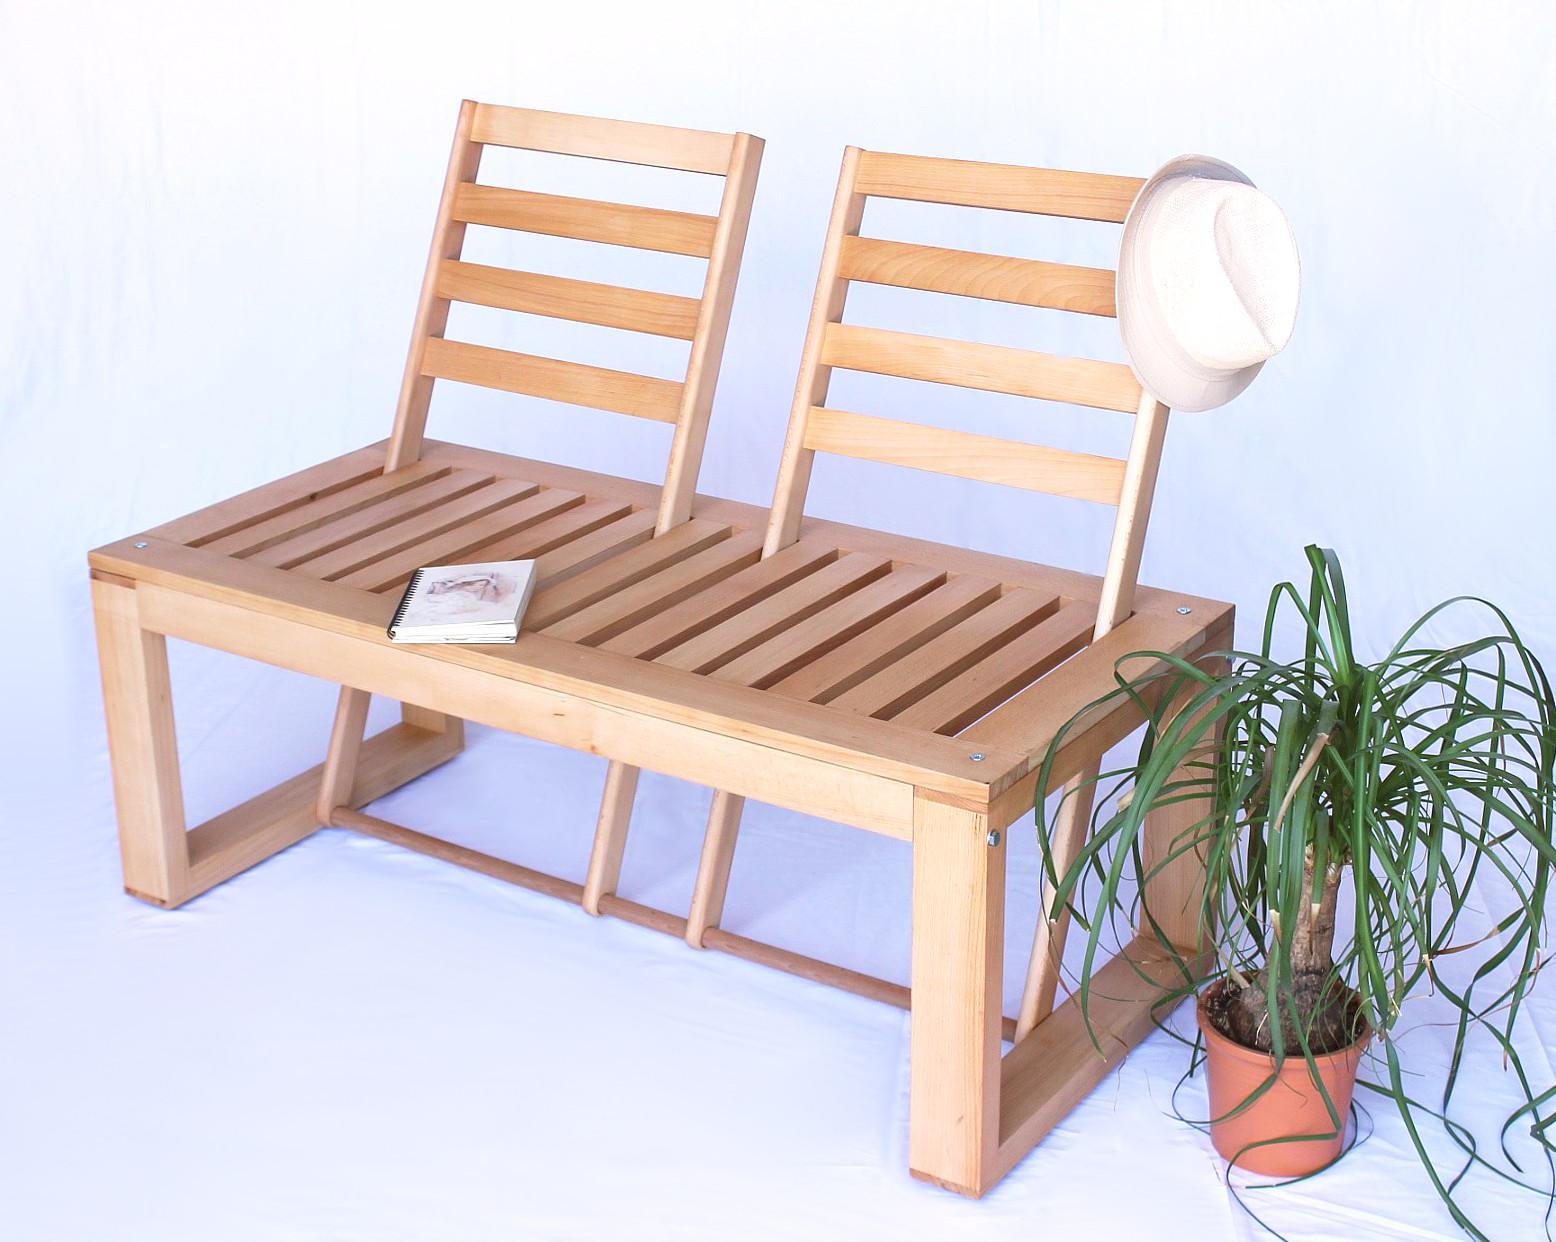 sitzbank gartenbank aus holz umklappare r ckenlehnen bank natur ebay. Black Bedroom Furniture Sets. Home Design Ideas